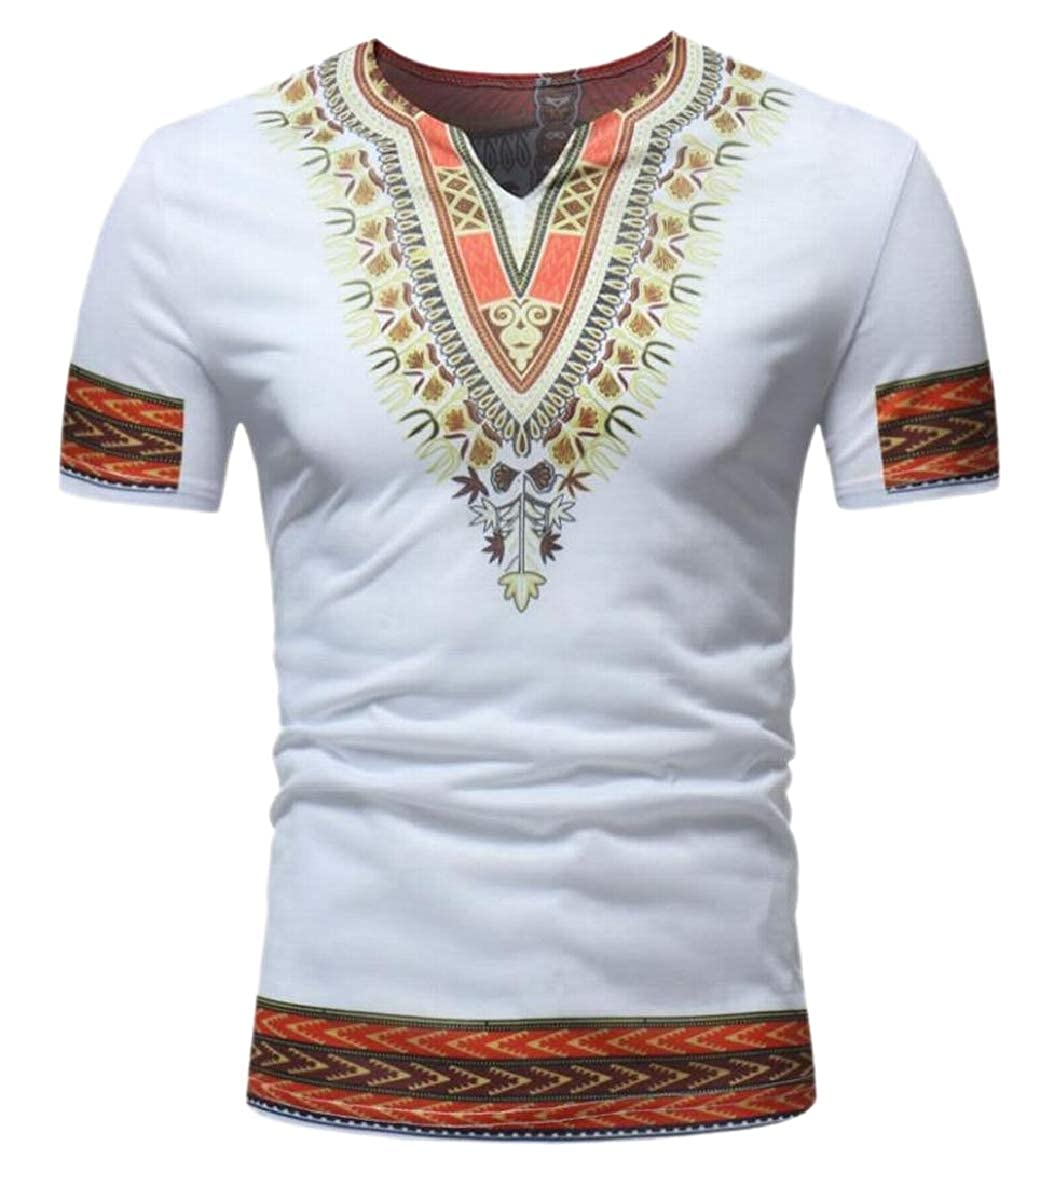 shinianlaile Mens African Tribal Dashiki Blouse V Neck Short Sleeve T Shirt